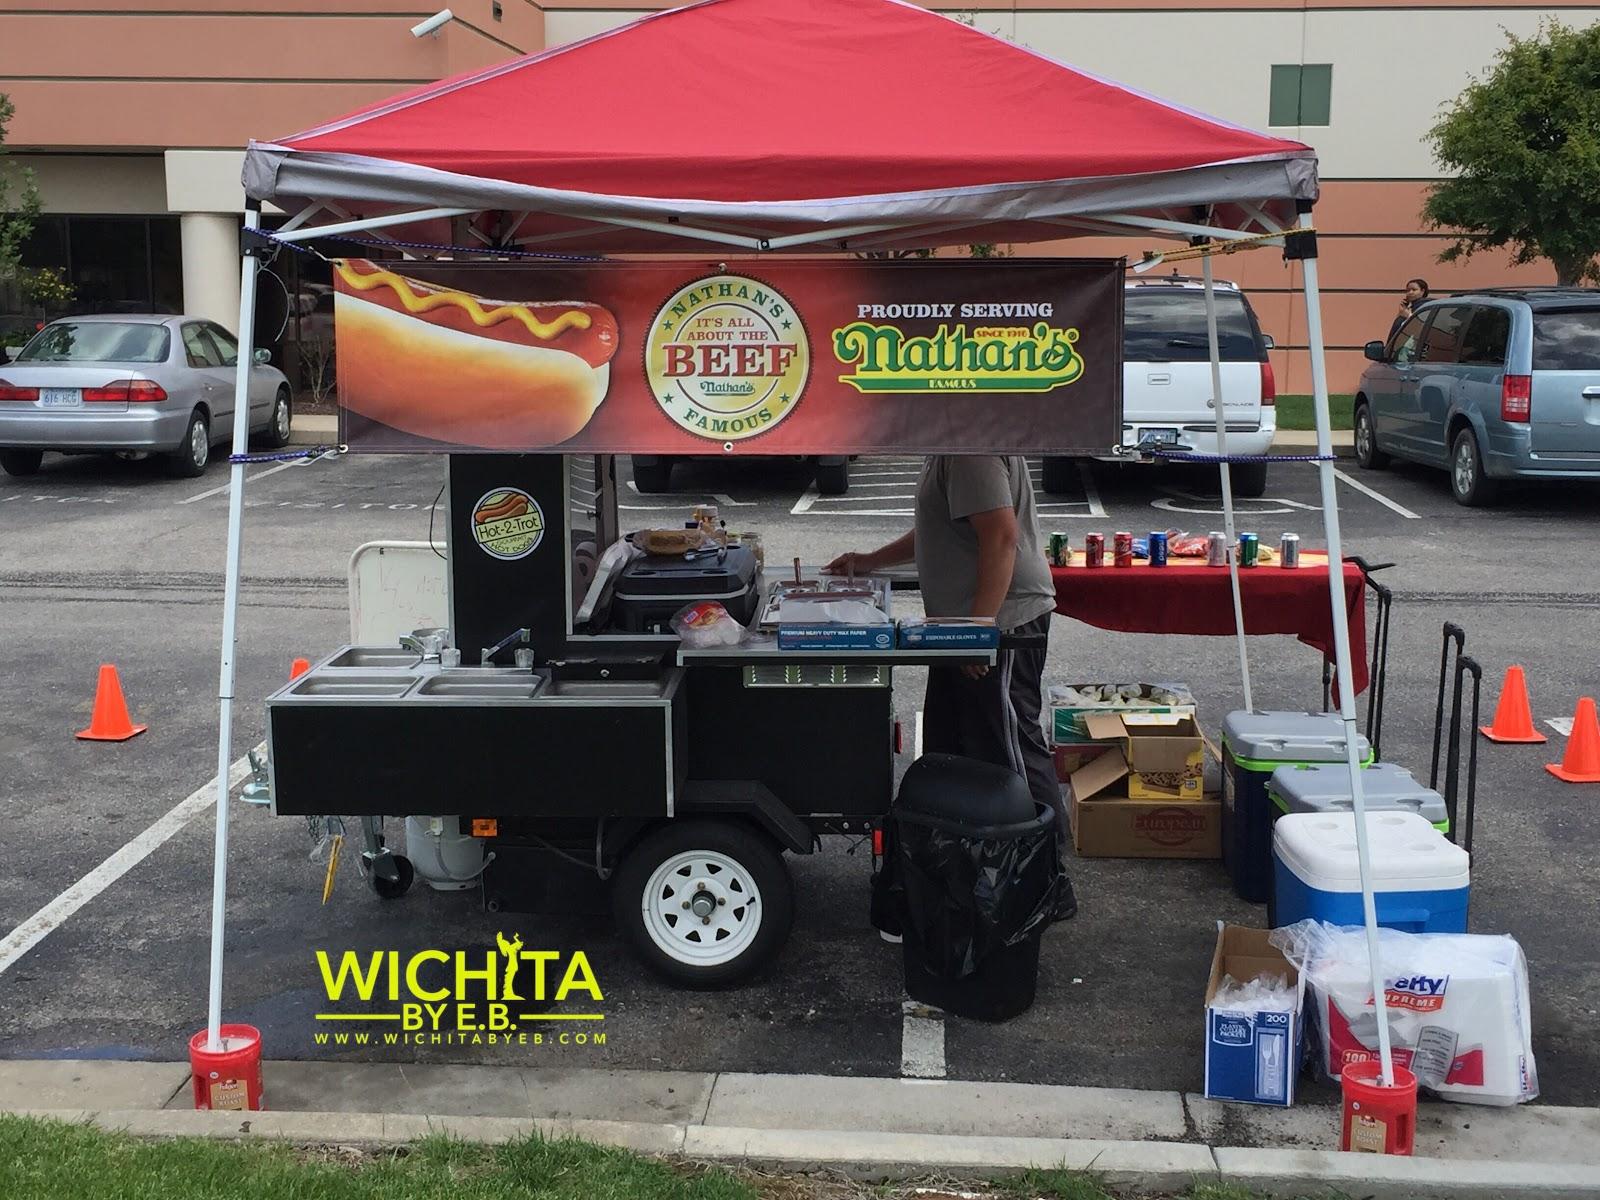 Food Truck Hot 2 Trot Gourmet Hotdogs Review